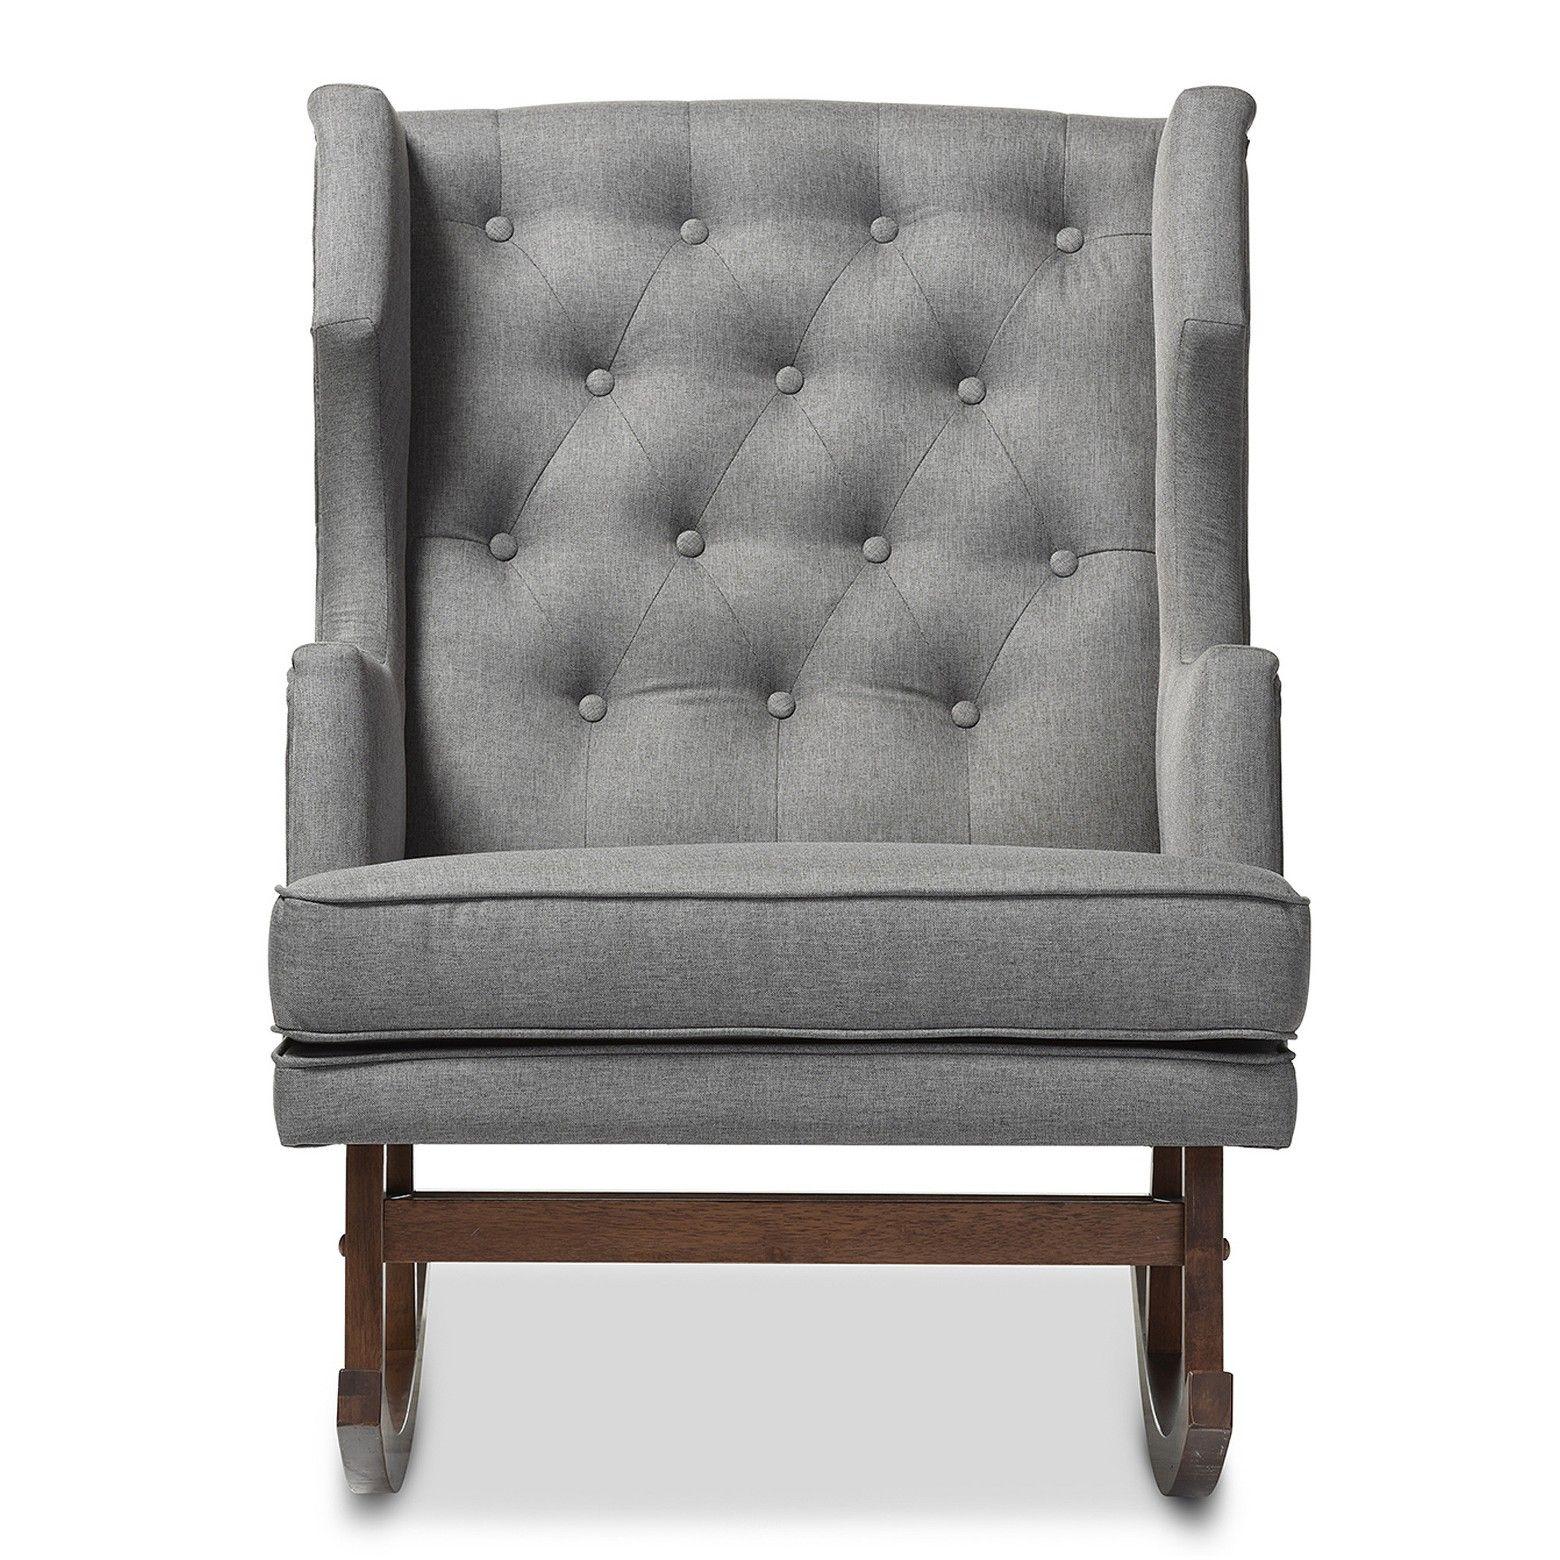 Baxton Studio Iona Mid  Century Retro Modern Fabric Upholstered